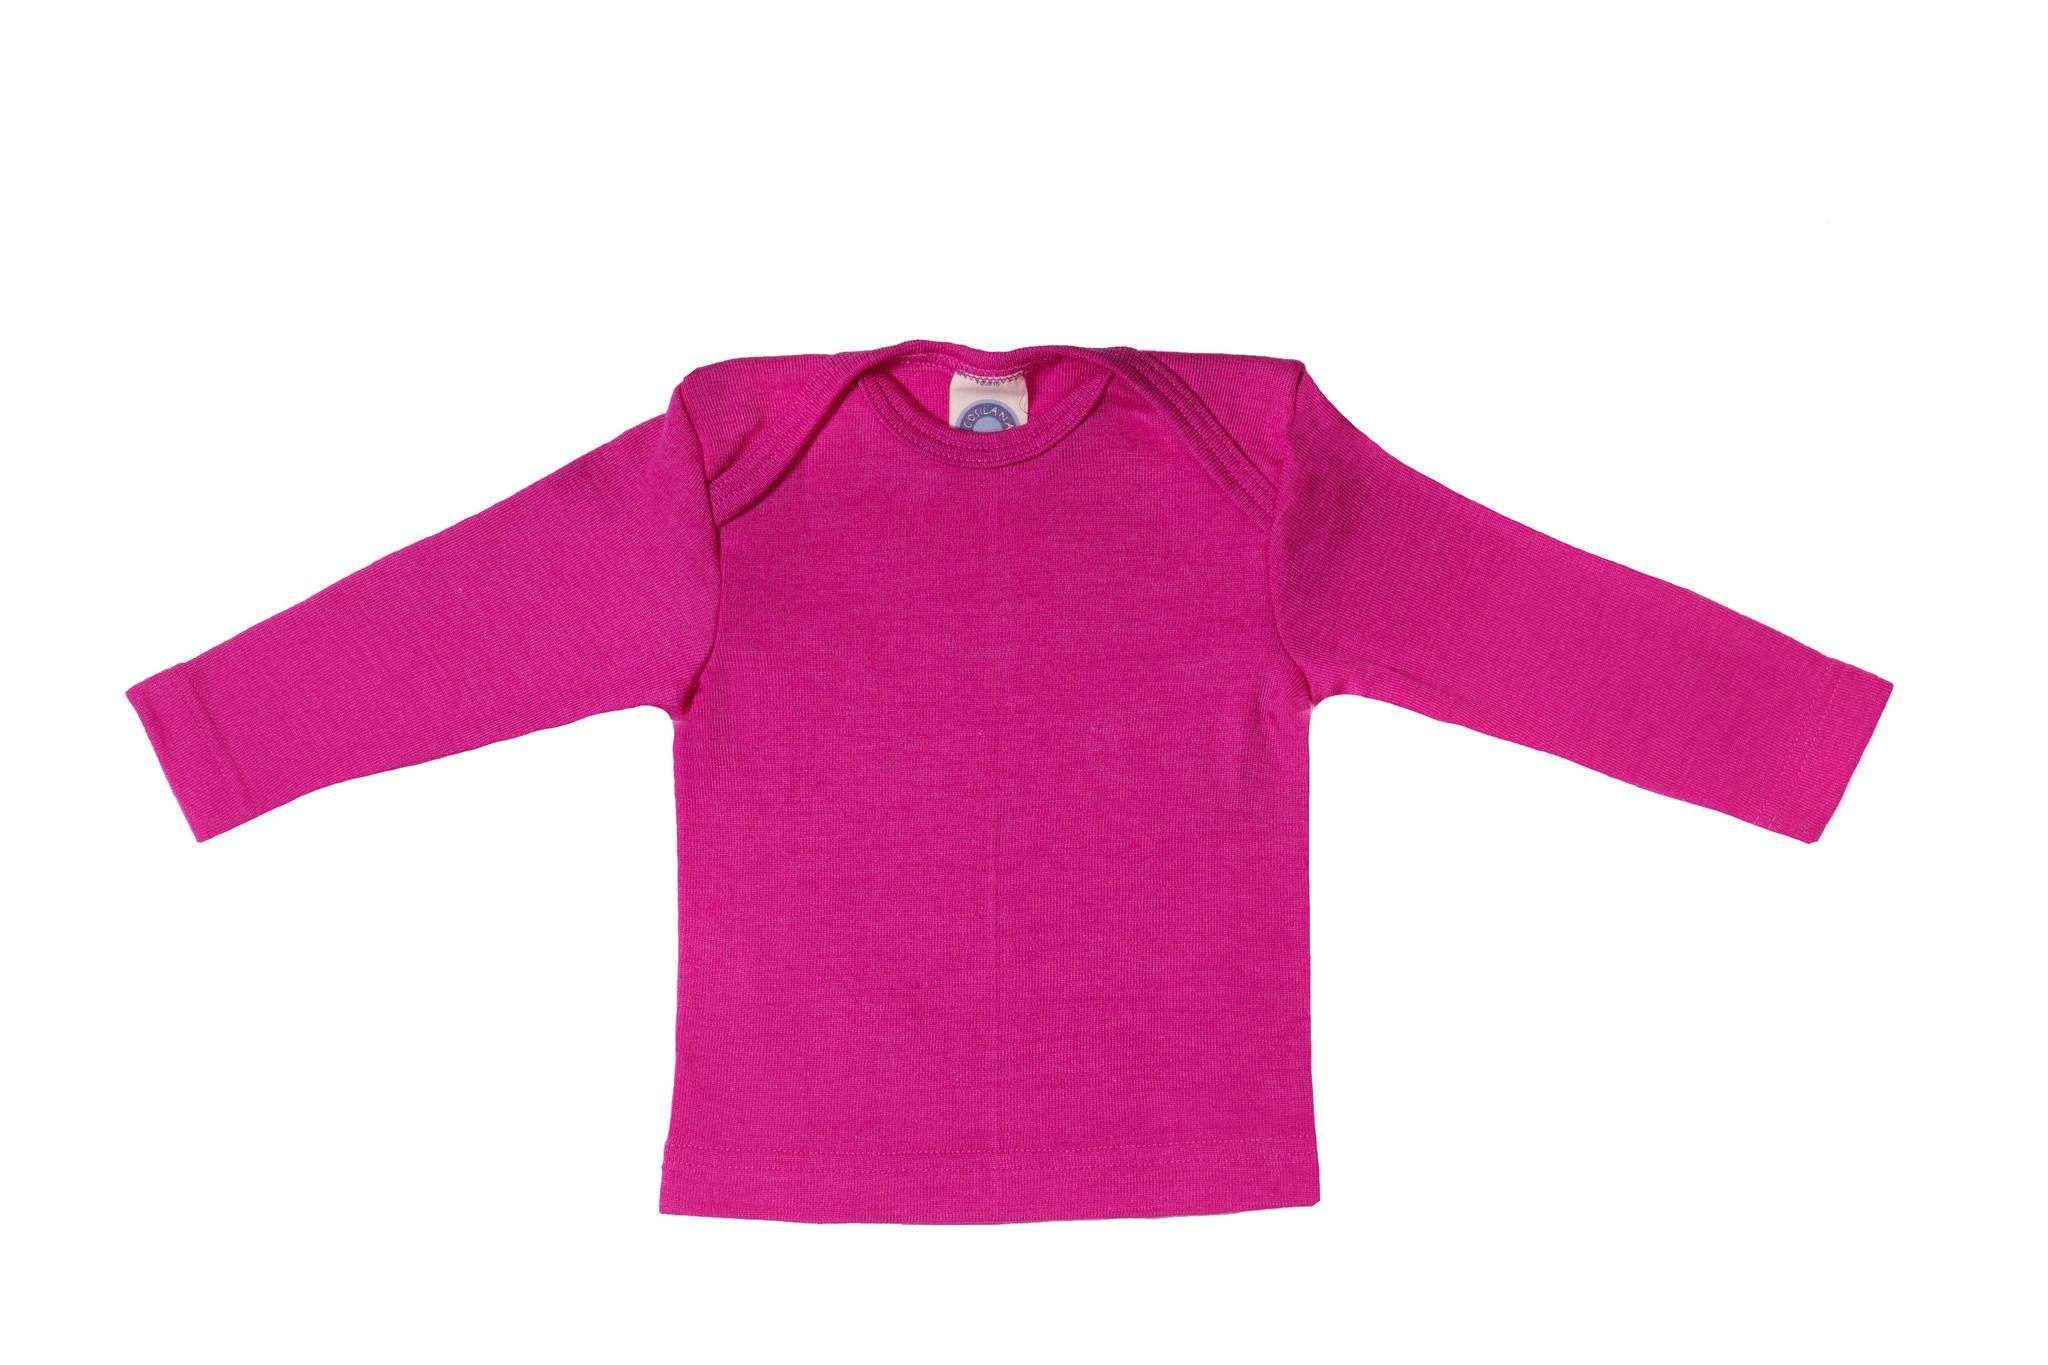 Cosilana Cosilana Babyhemdje Wol/Zijde lange mouw - Pruim (23)